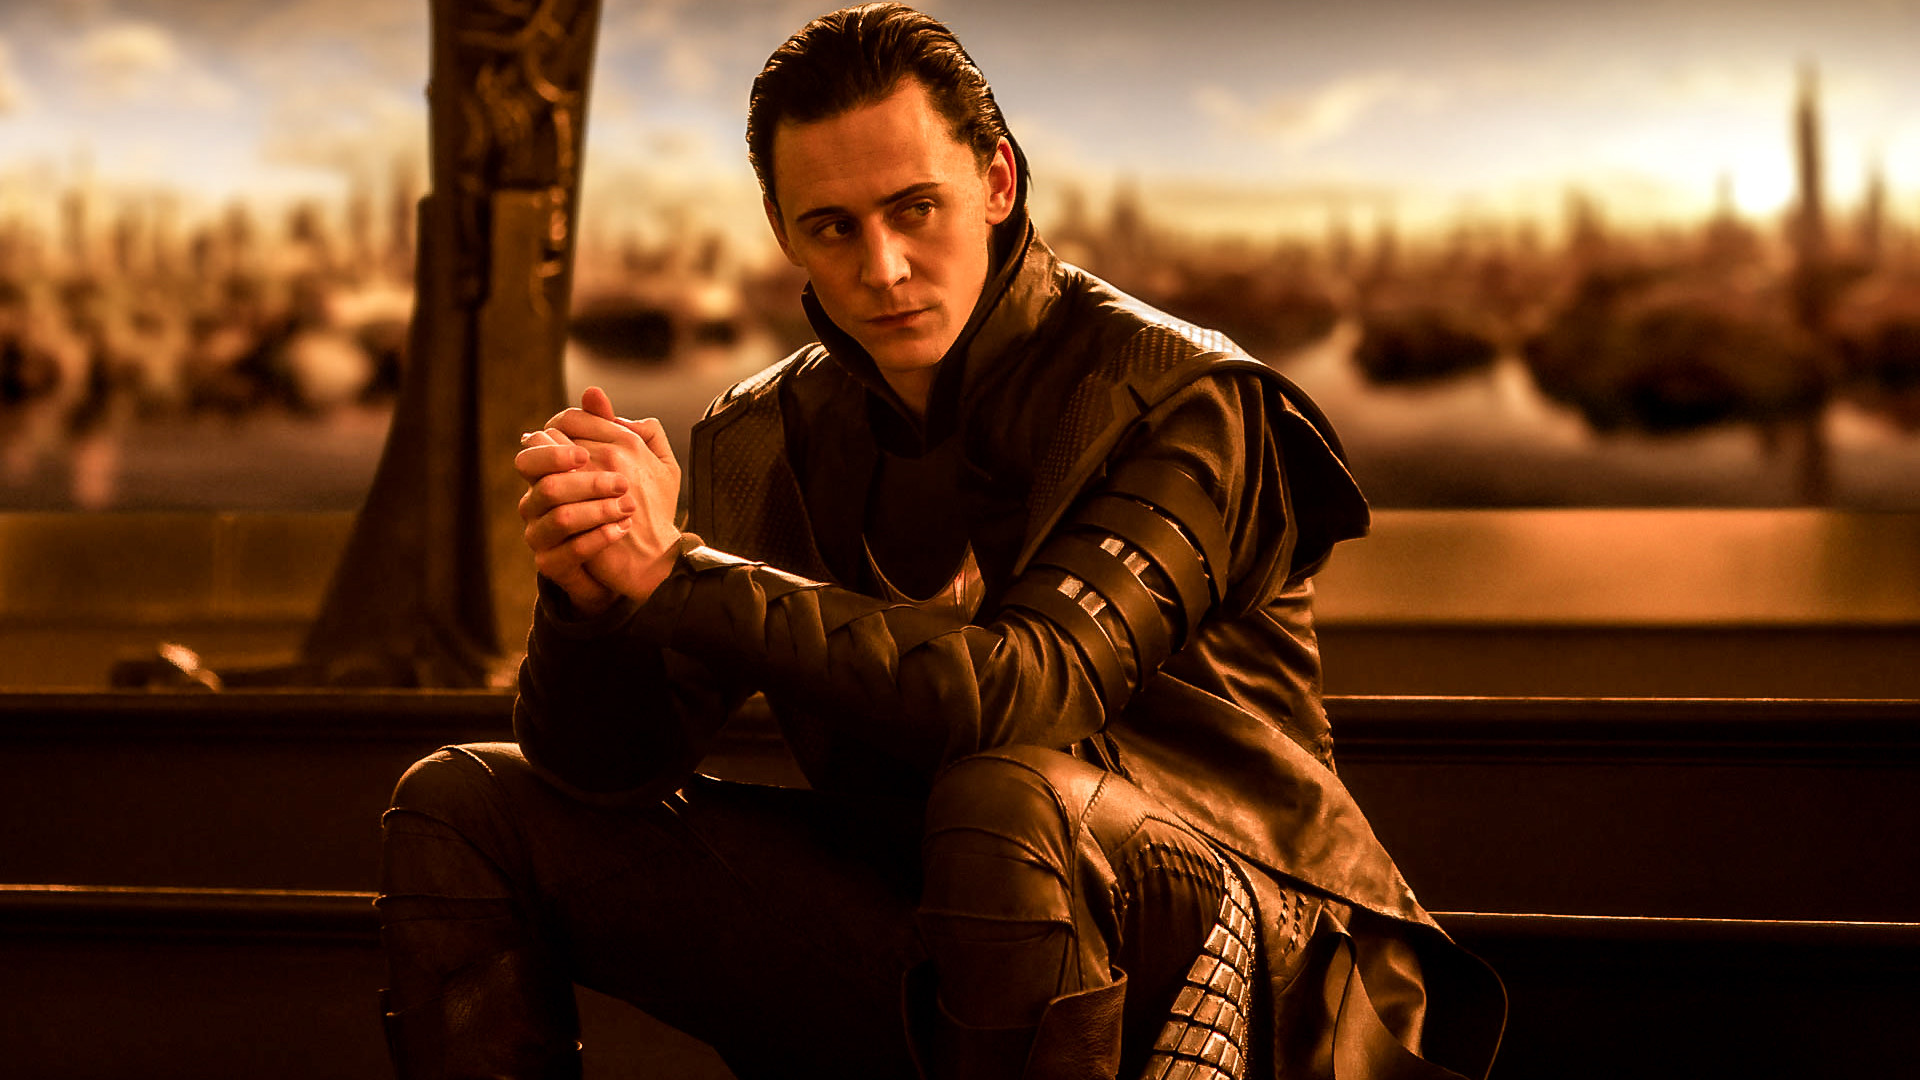 *click for full-sized version* Loki Tom Hiddleston Wallpaper 1600 x 900